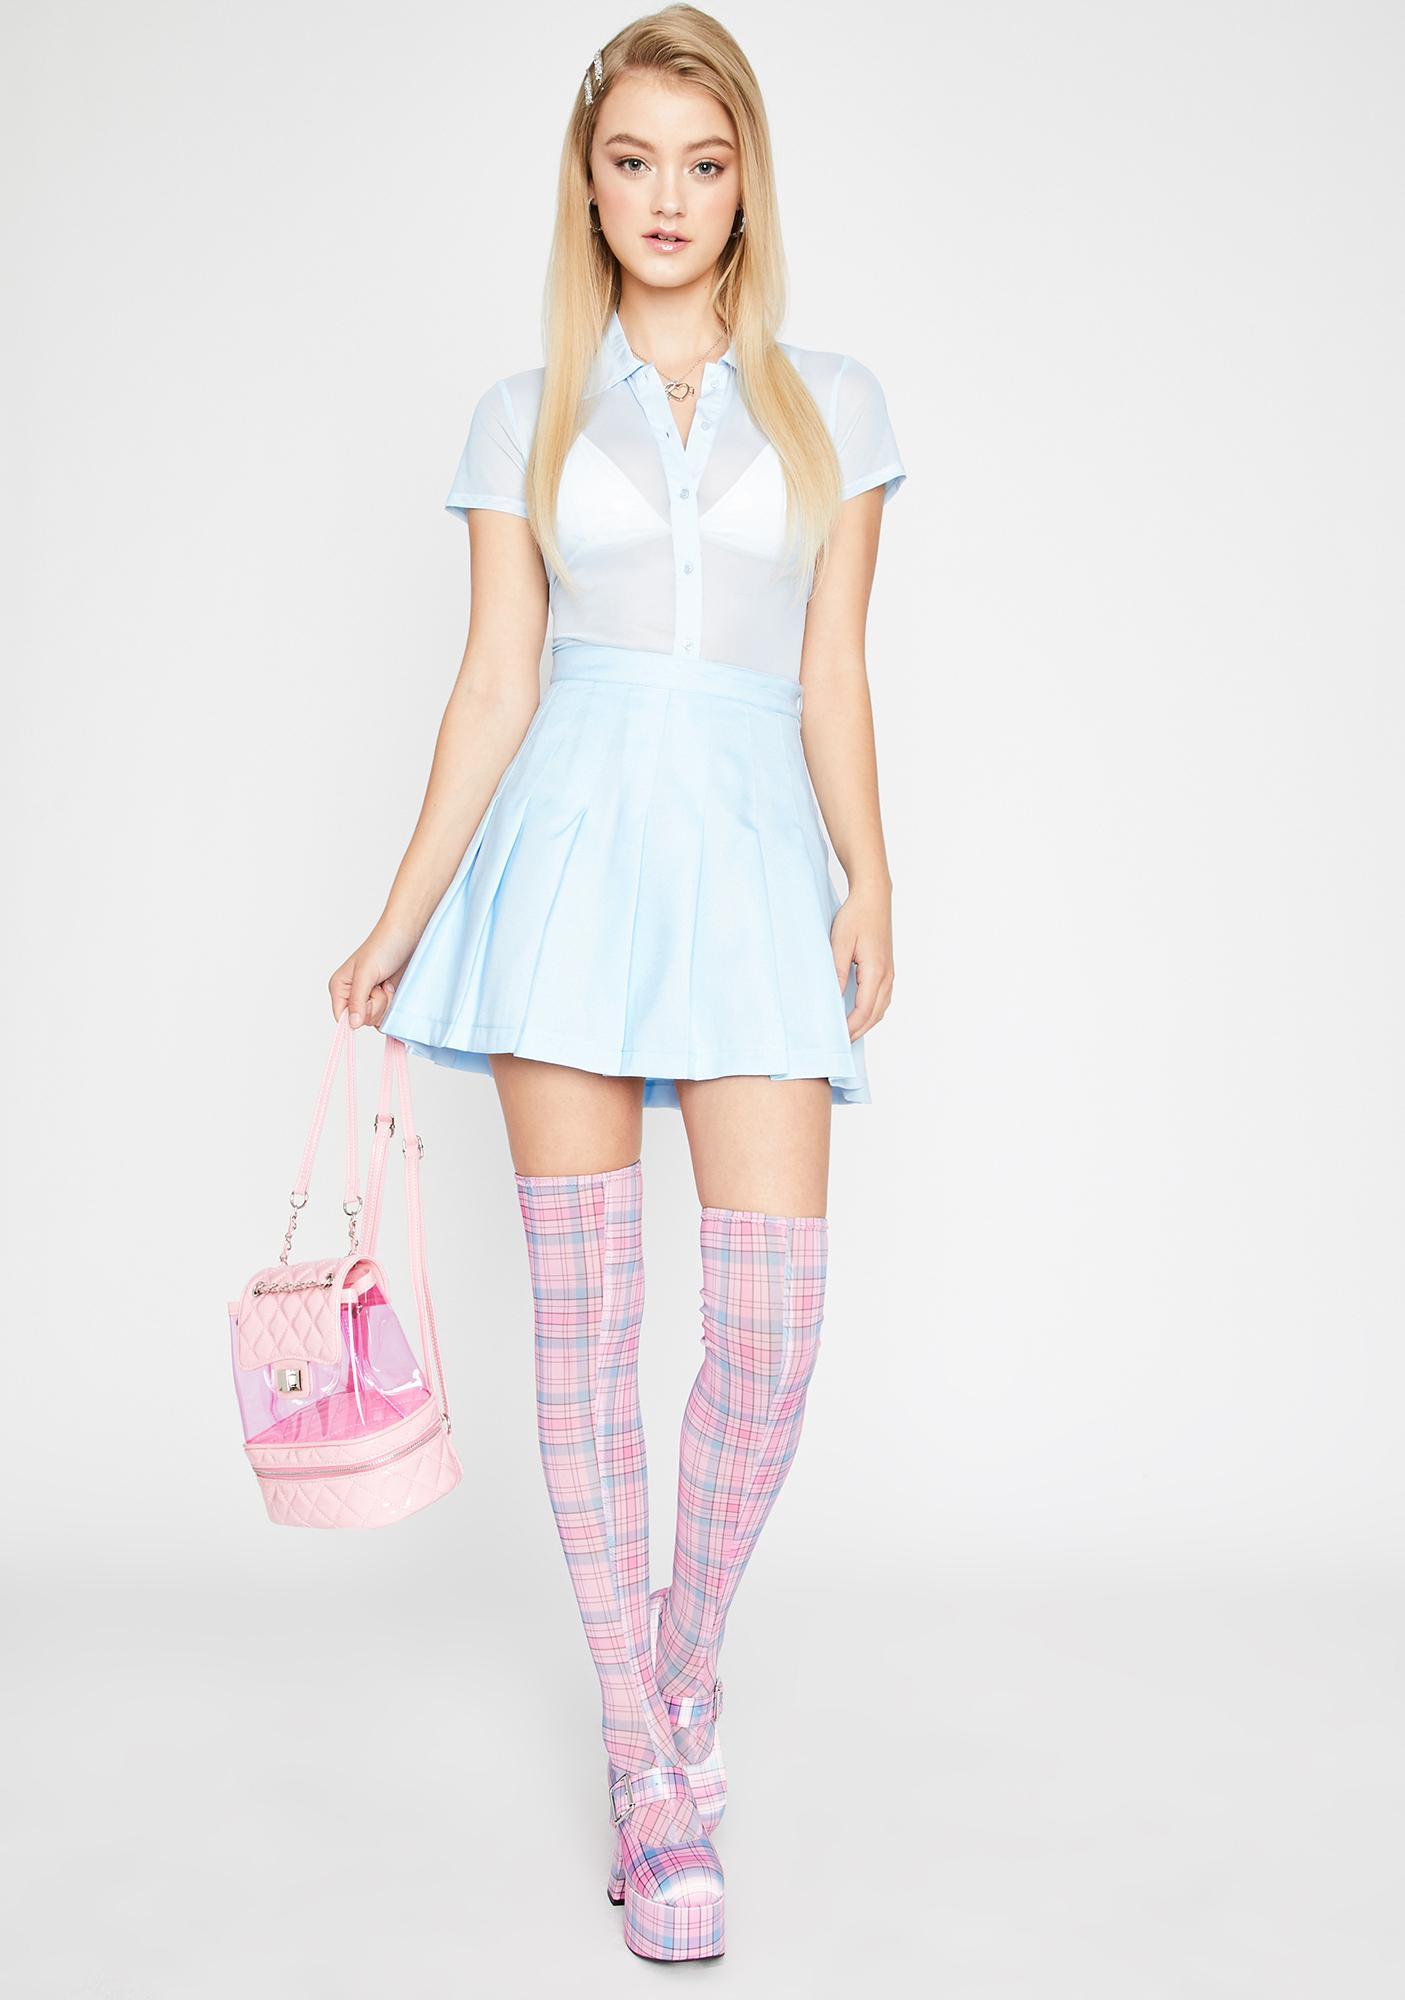 Sugar Thrillz Kind Of A Big Deal Mini Skirt